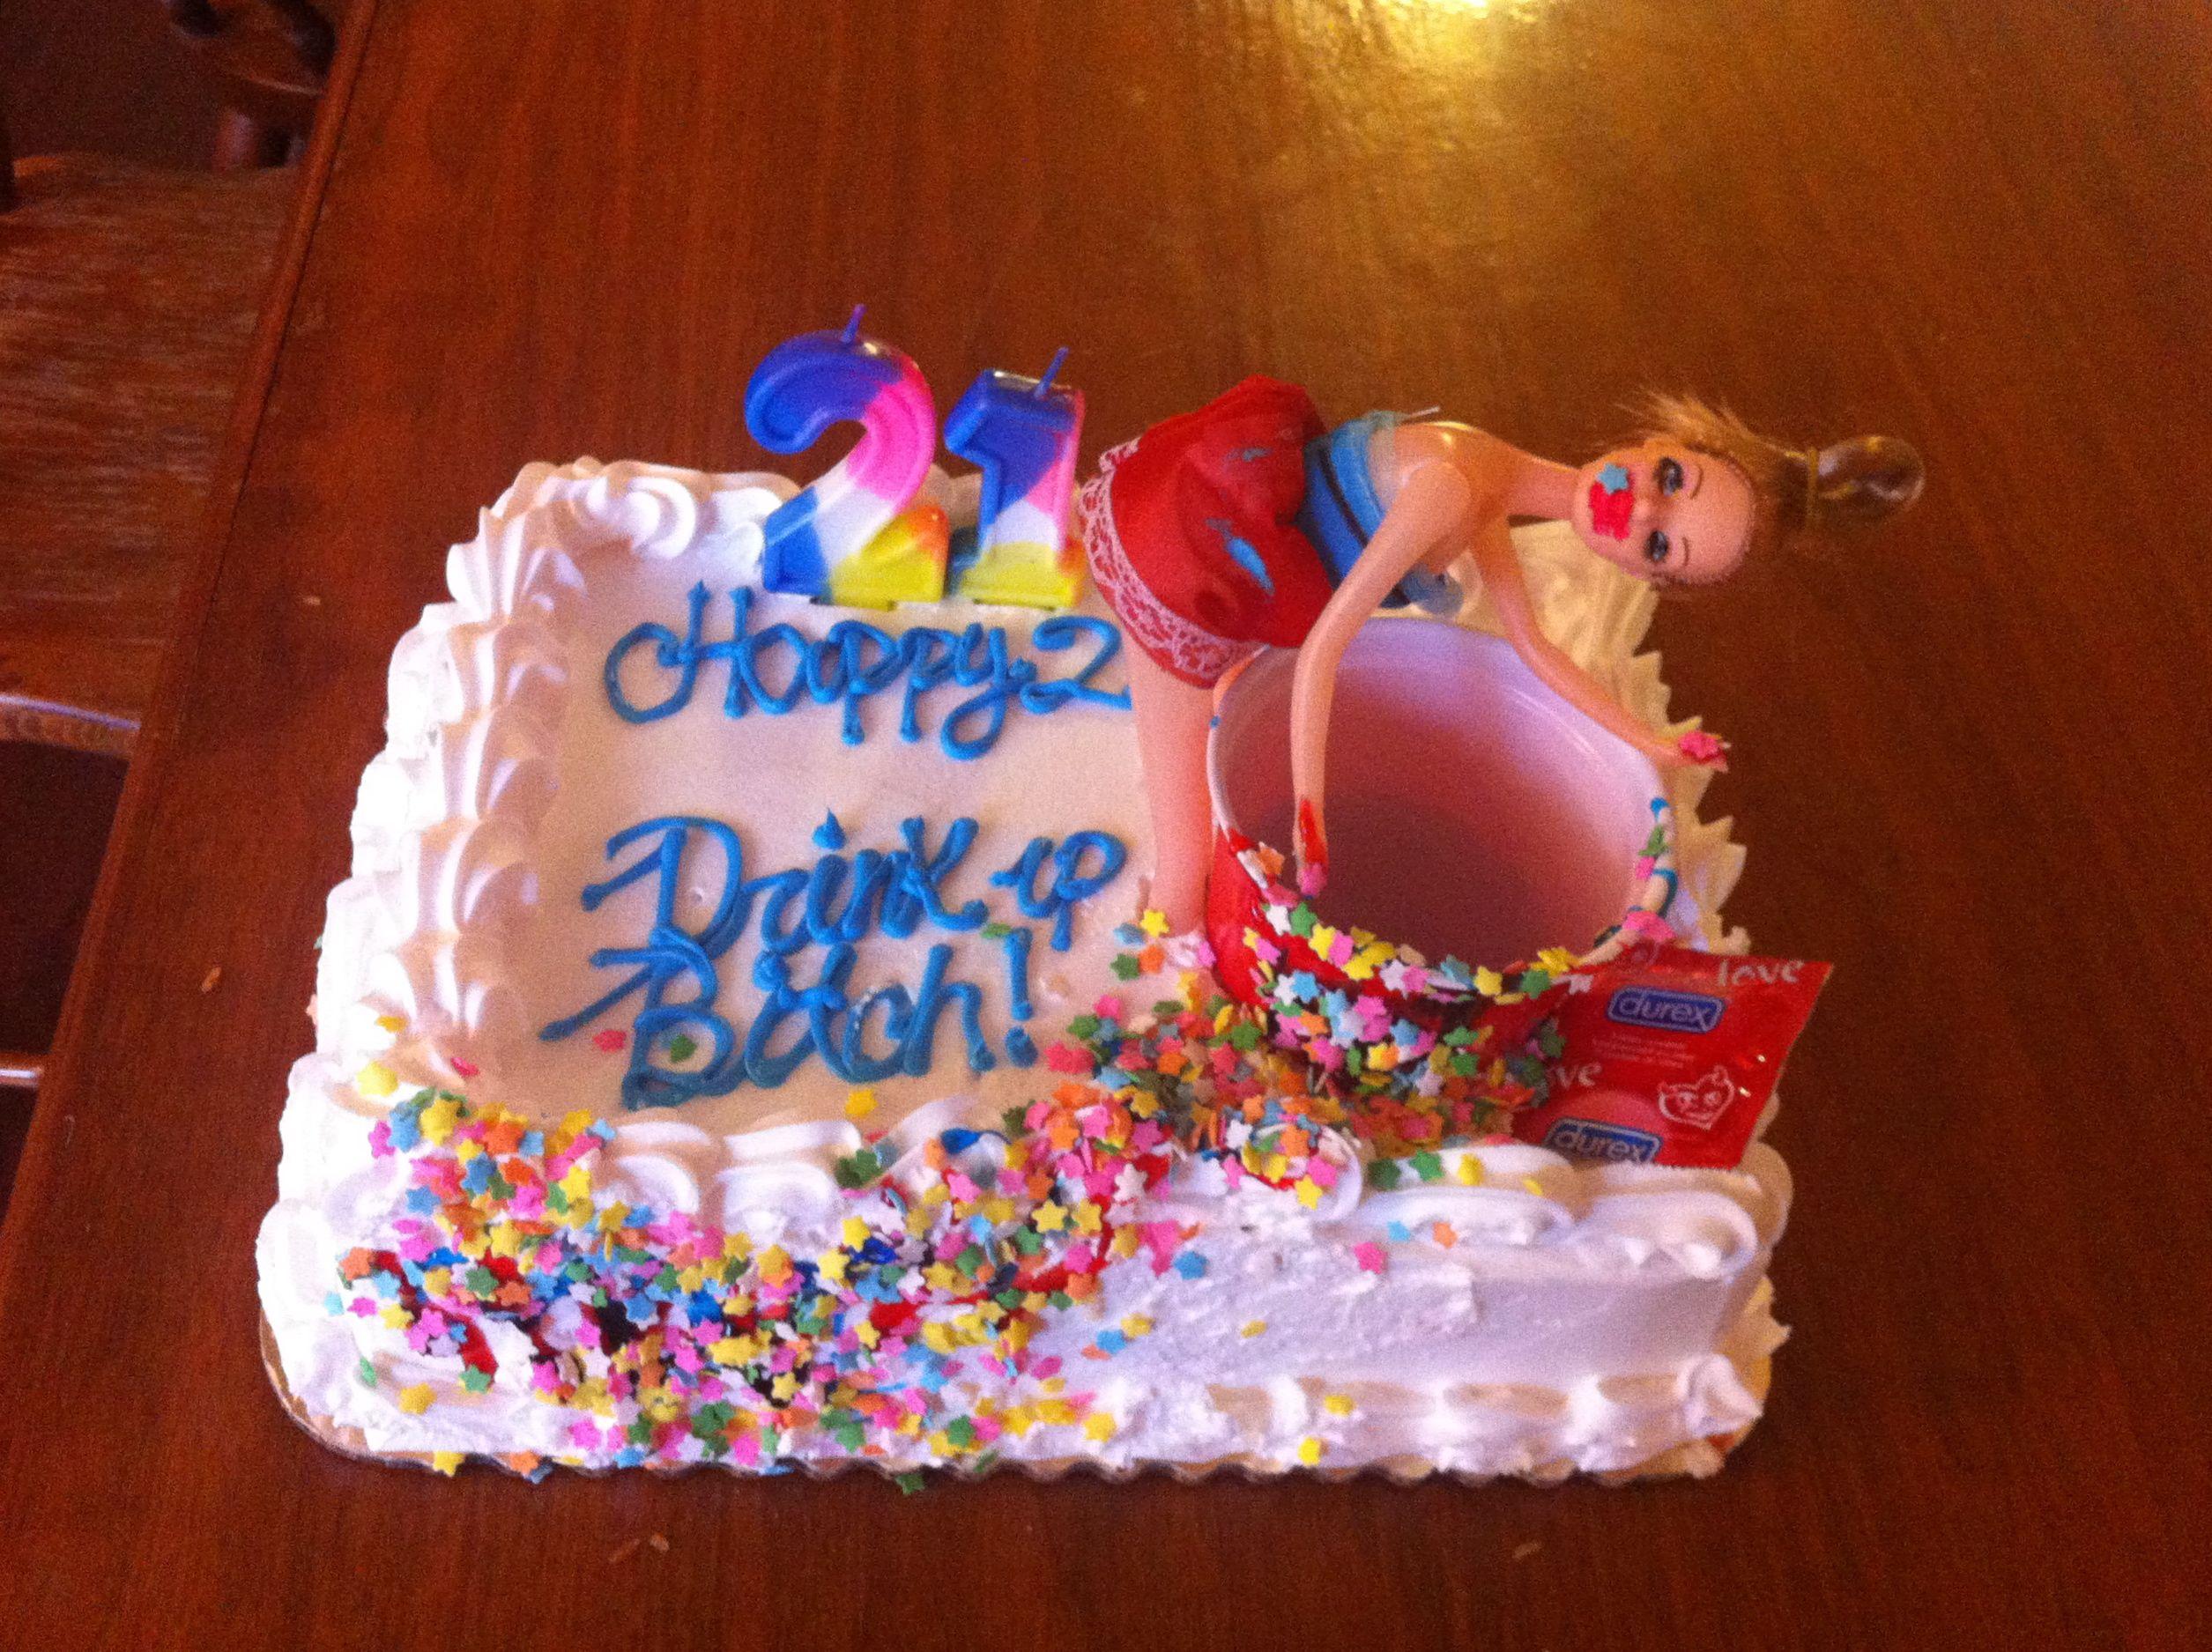 21st Birthday Cake decorated by yours truly hotmess 21 twentyone